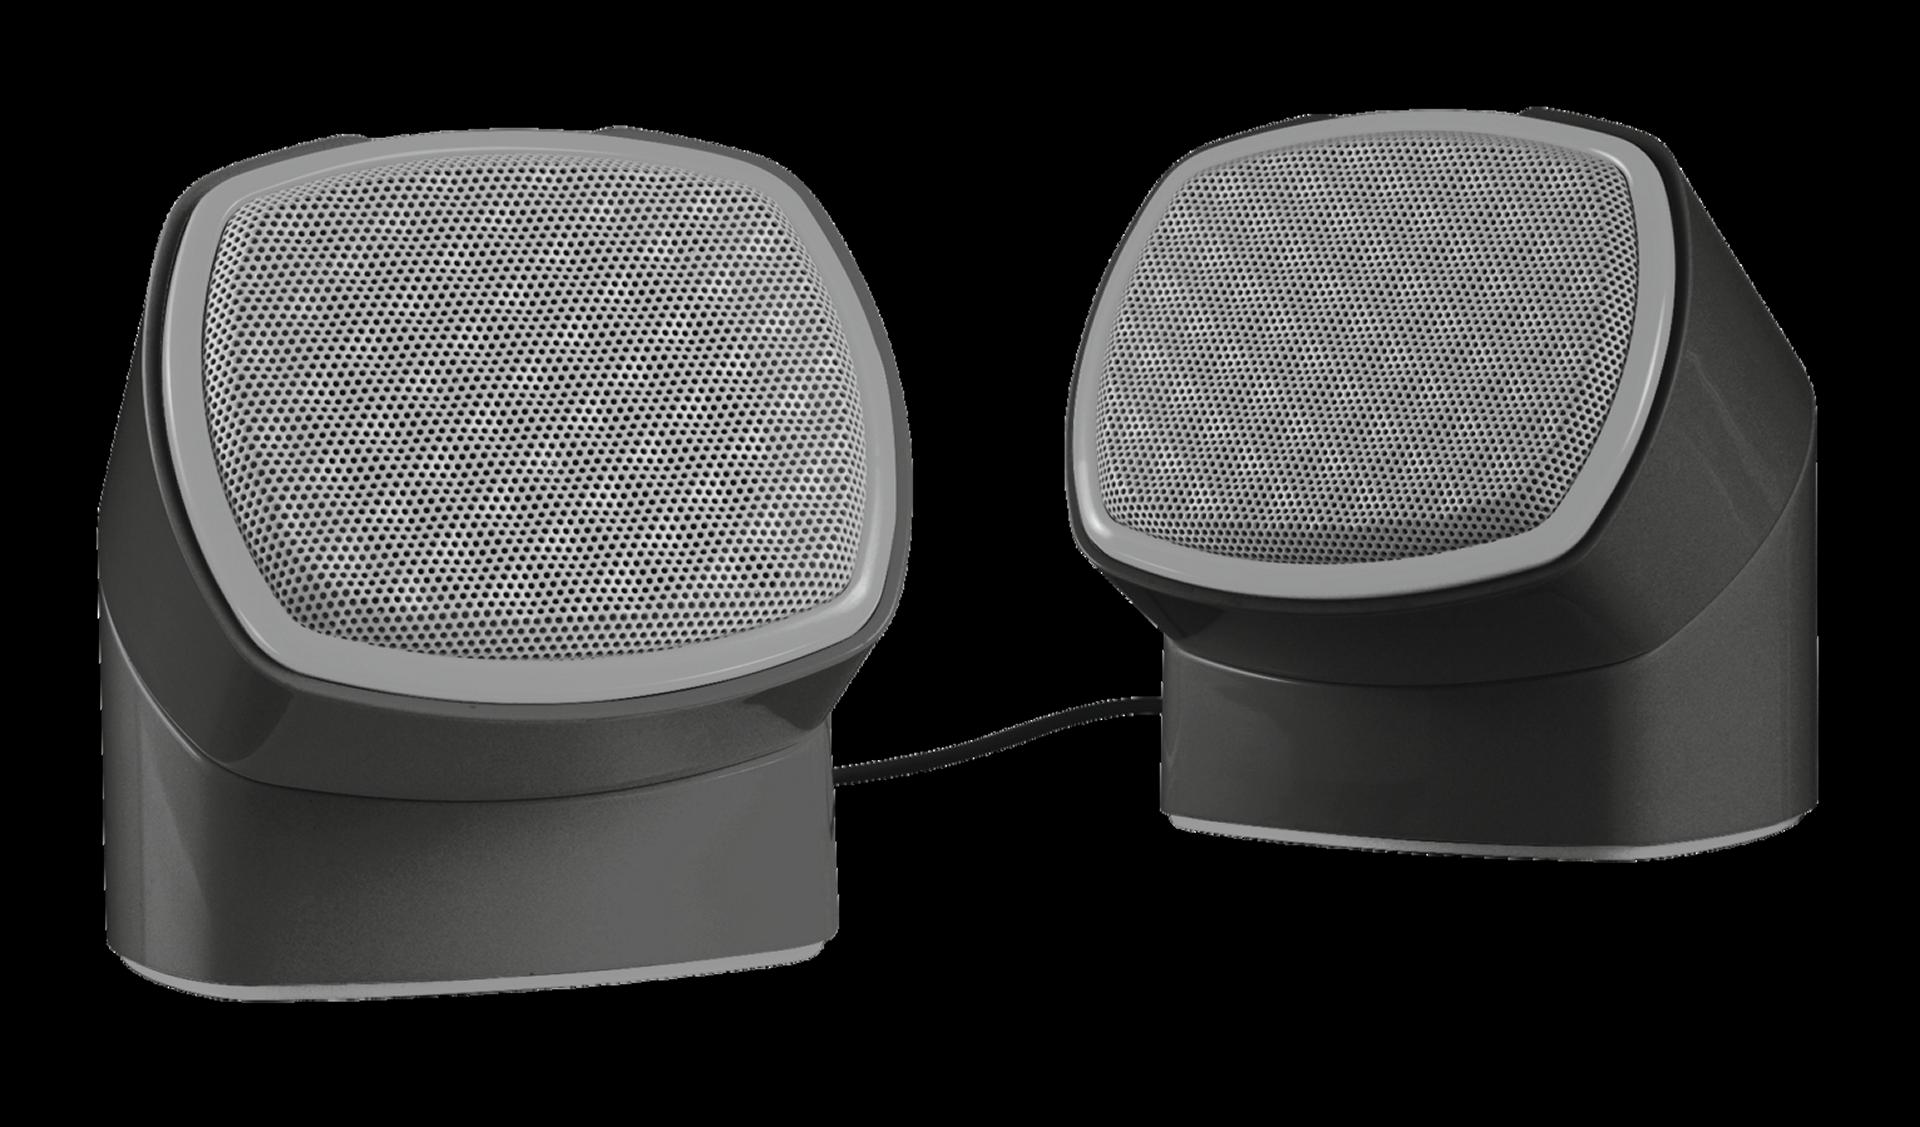 repro TRUST Twizt Rotating 2.0 Speaker Set